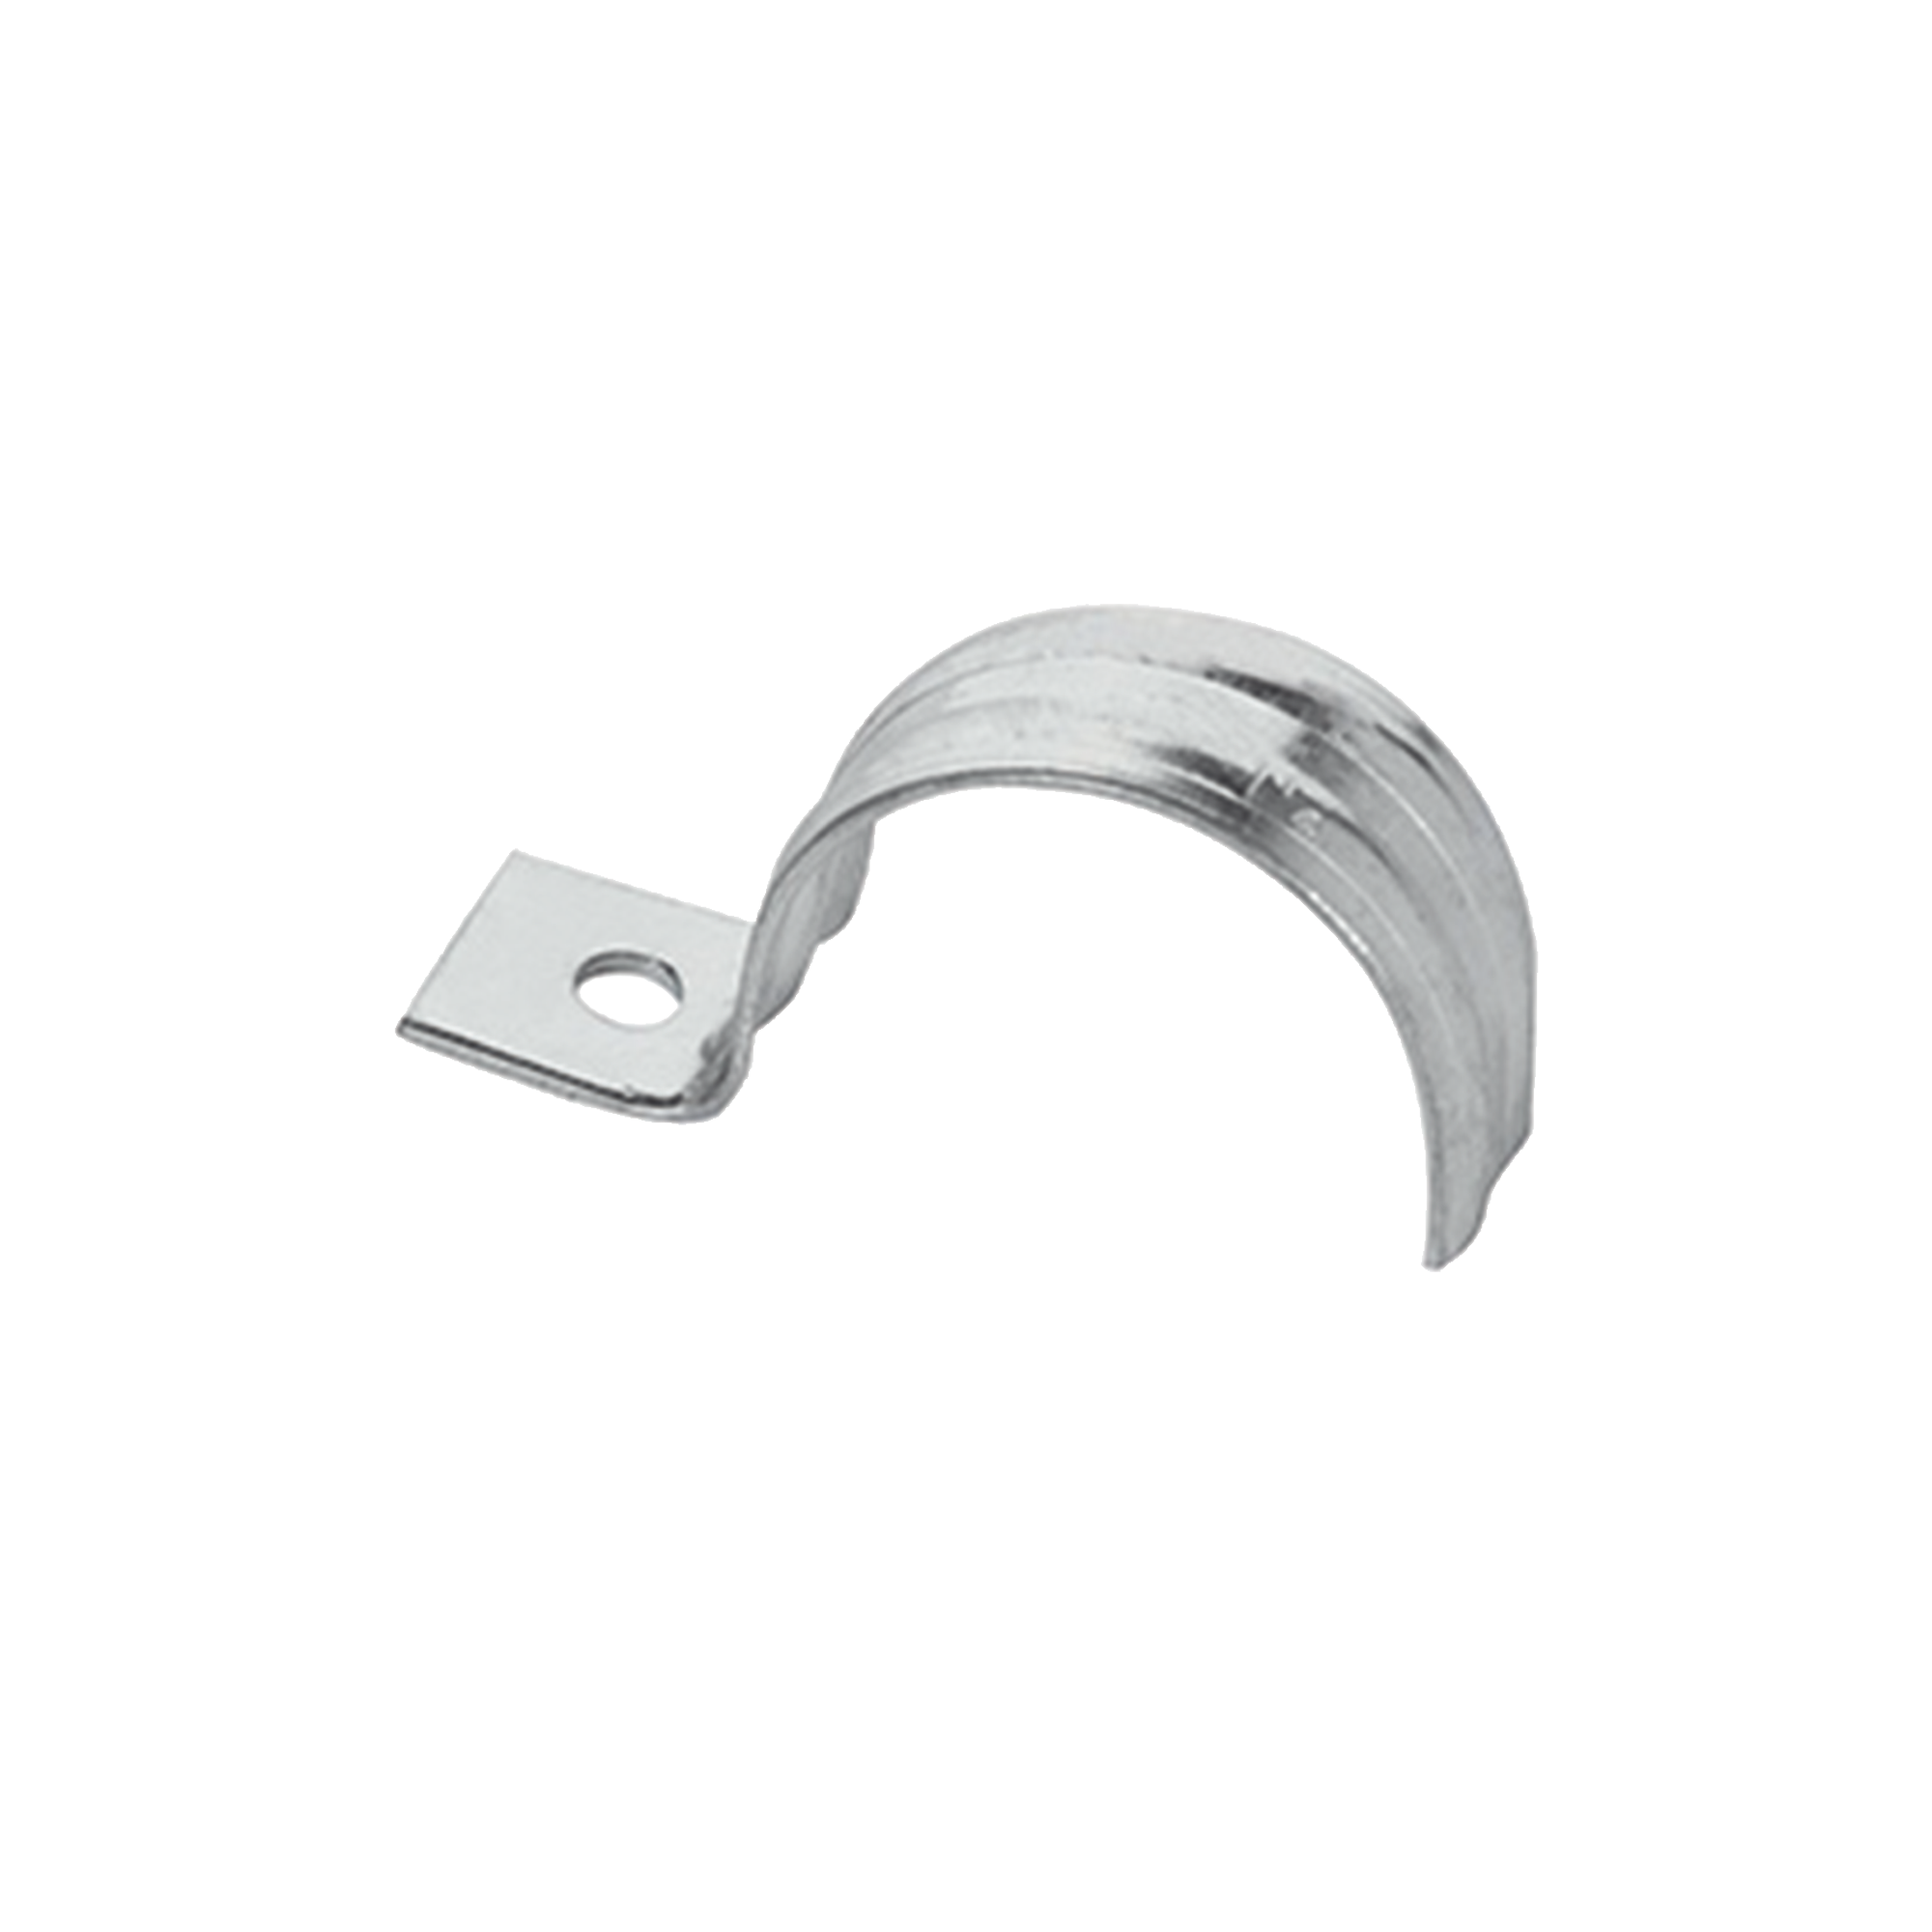 Abrazadera para tubo tipo uña 1 1/2 bolsa con 5 piezas